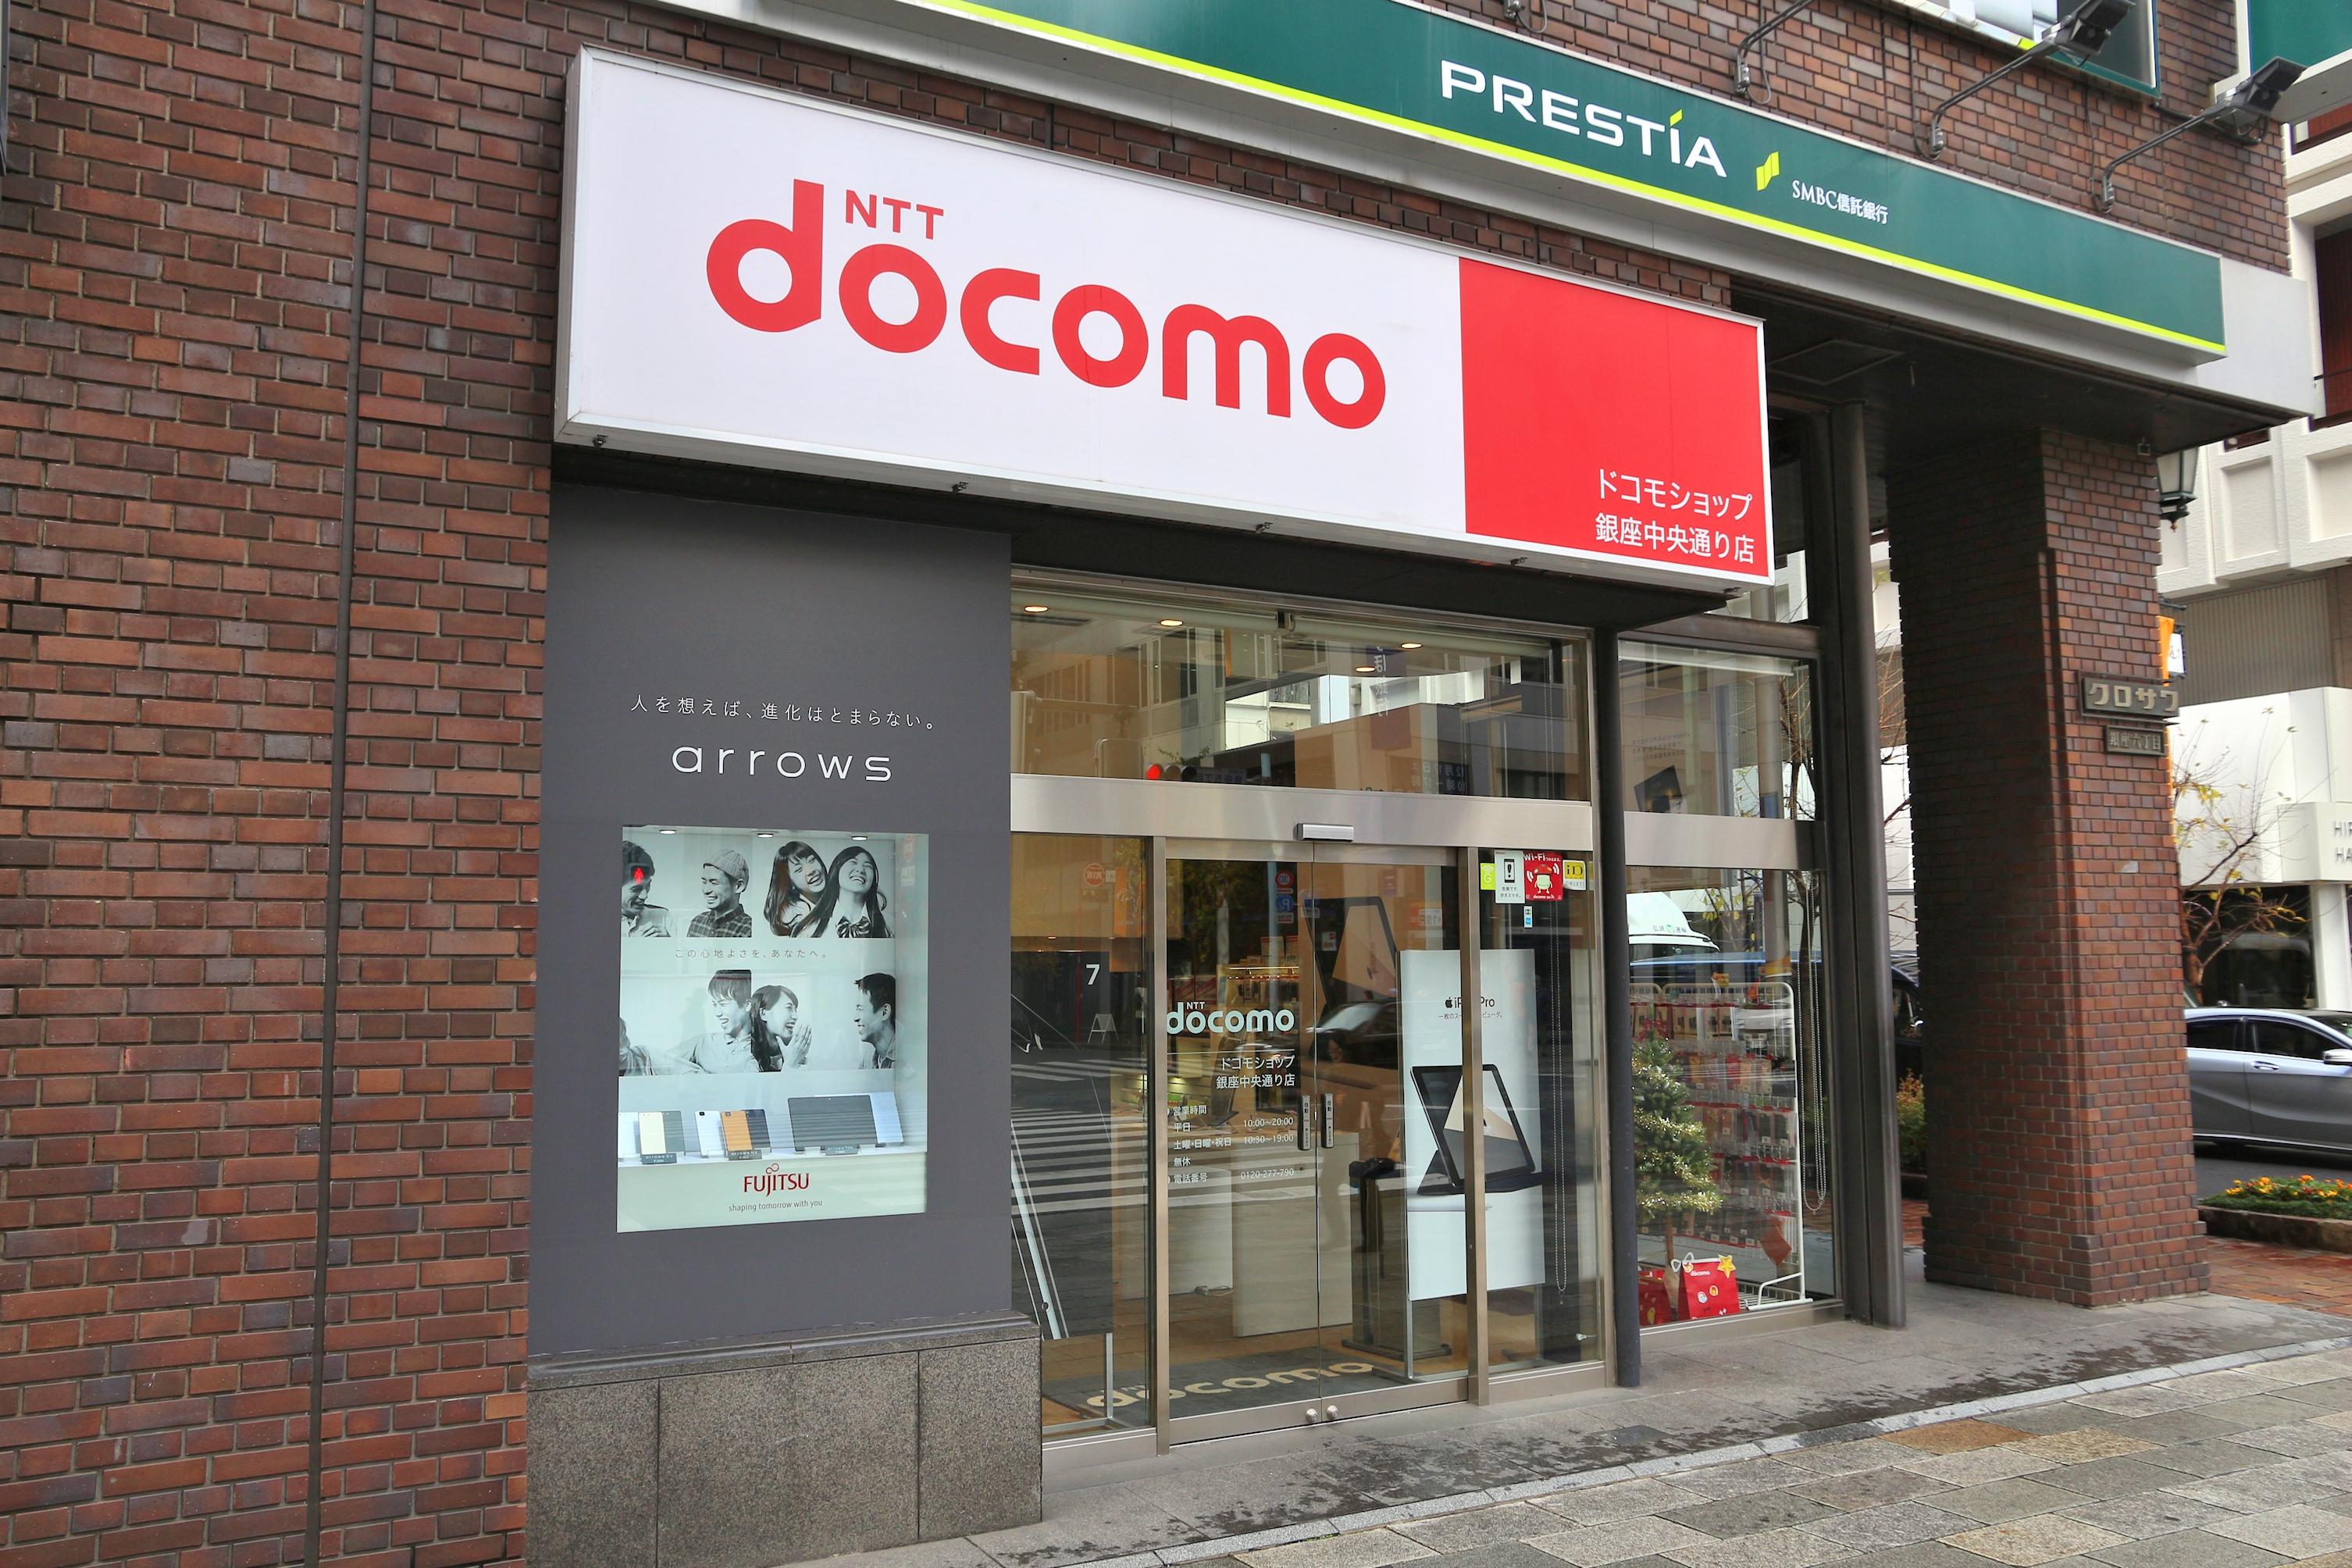 bigstock-Japan-Ntt-Docomo-187038622.jpg